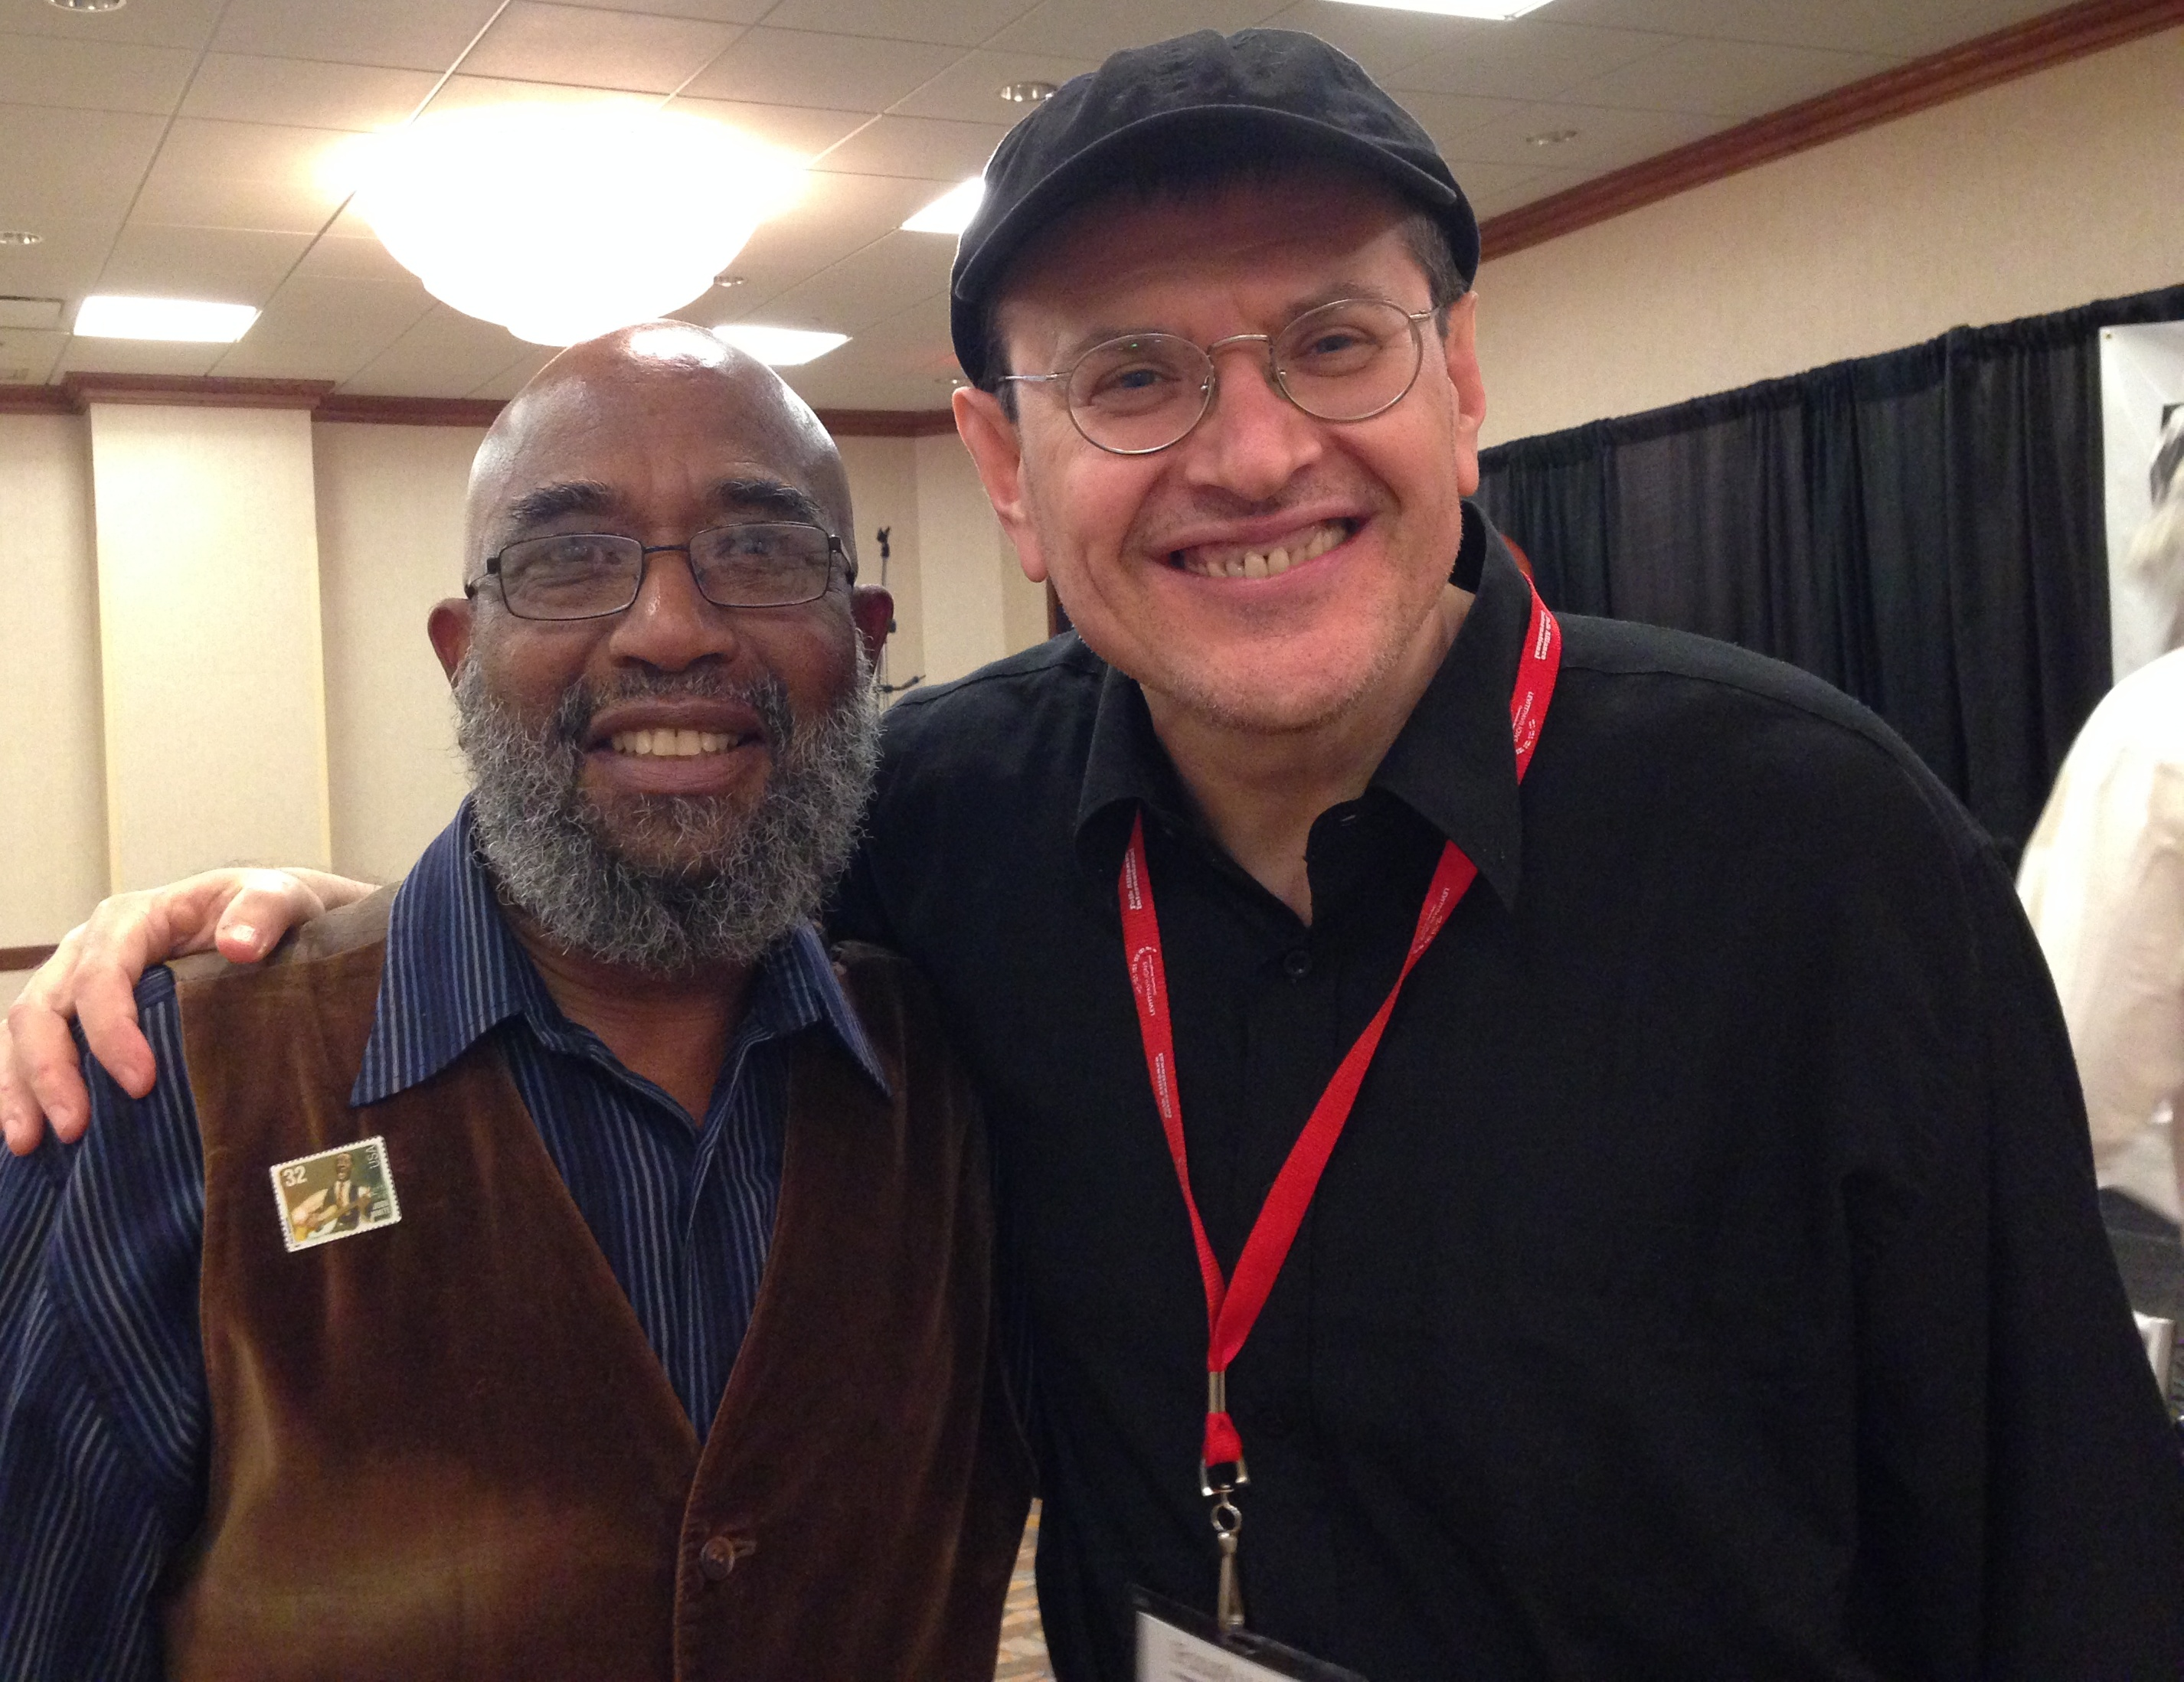 Josh White & Fabrizio Poggi Folk Alliance 2014 Kansas City